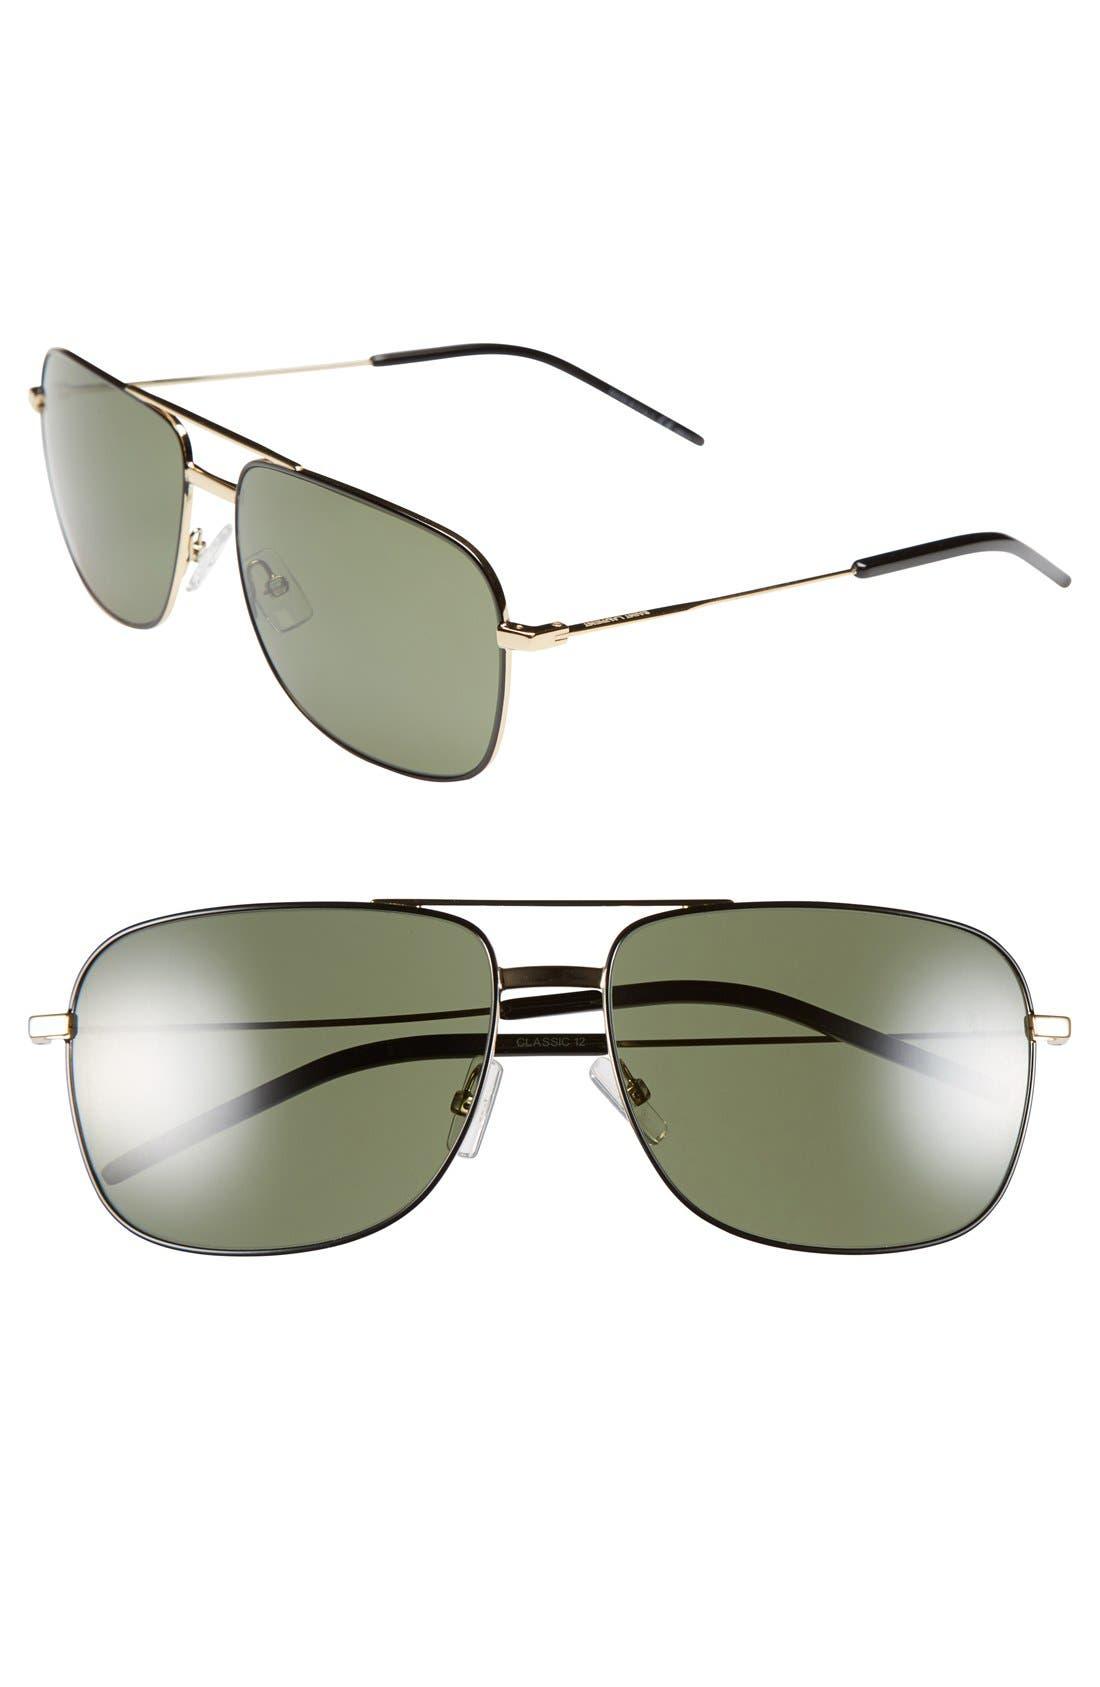 Main Image - Saint Laurent 59mm Navigator Sunglasses